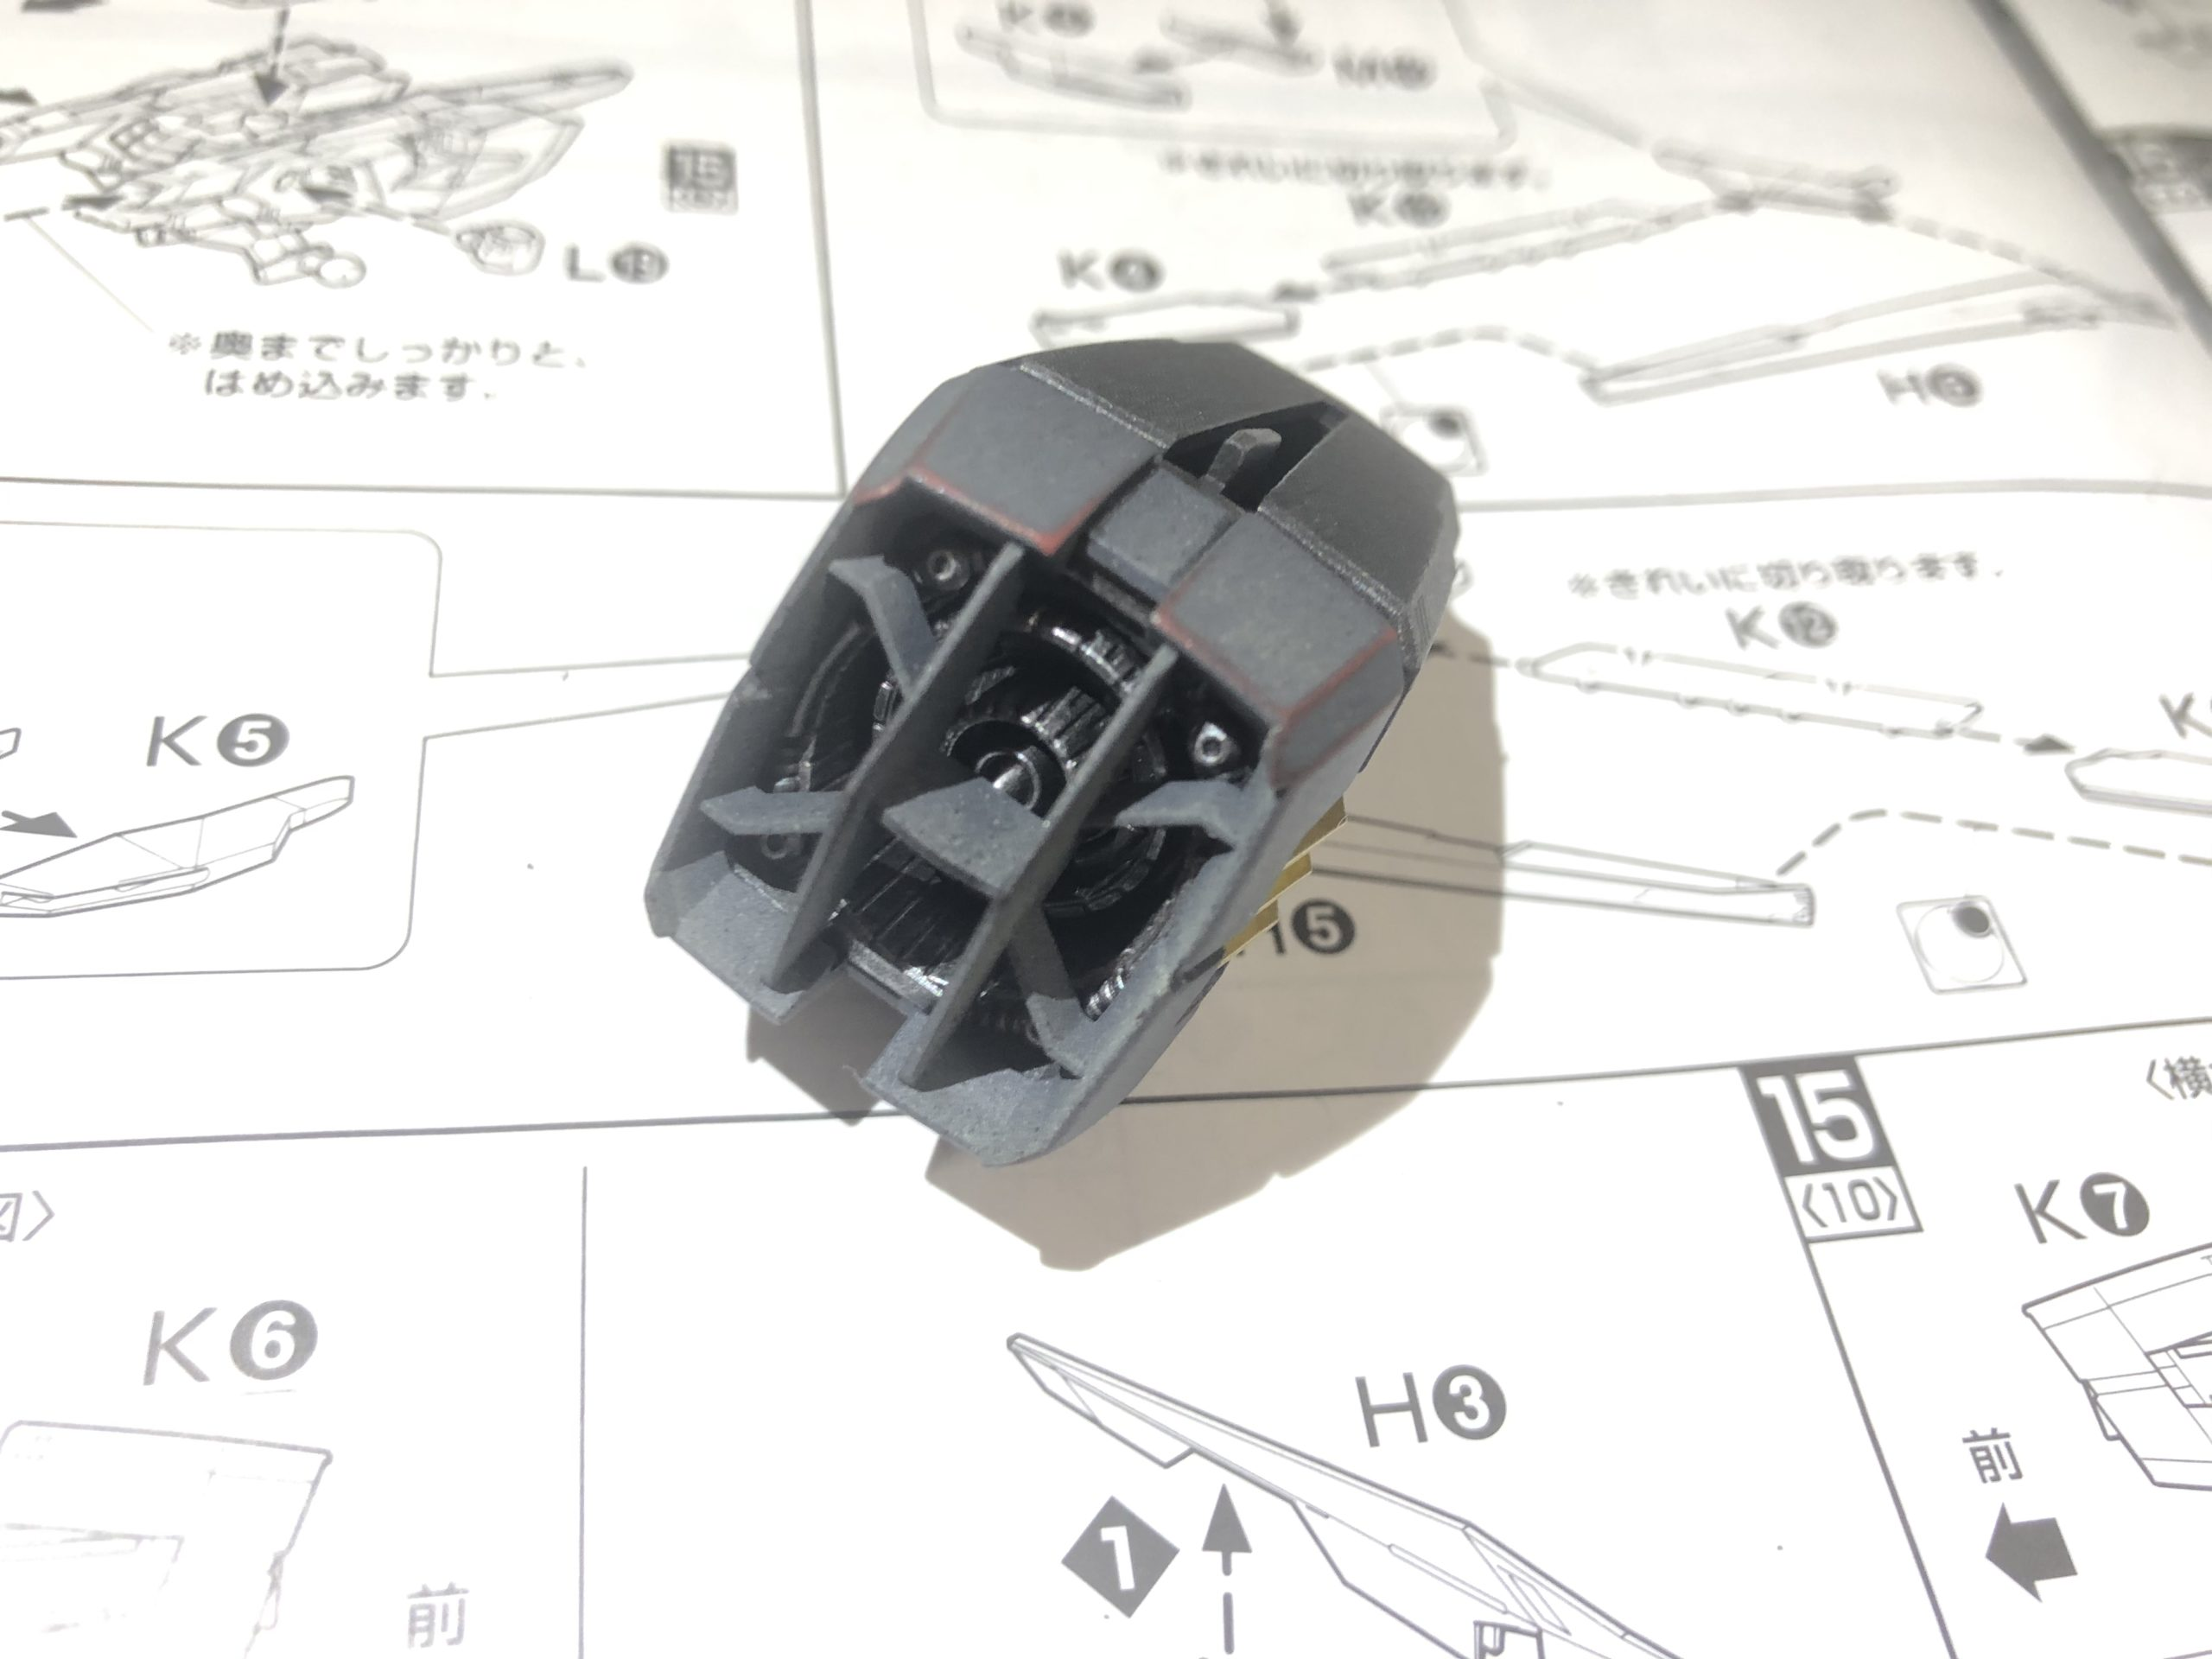 GAT-X105 AILE STRIKE GUNDAM ディアクティブモード1/100